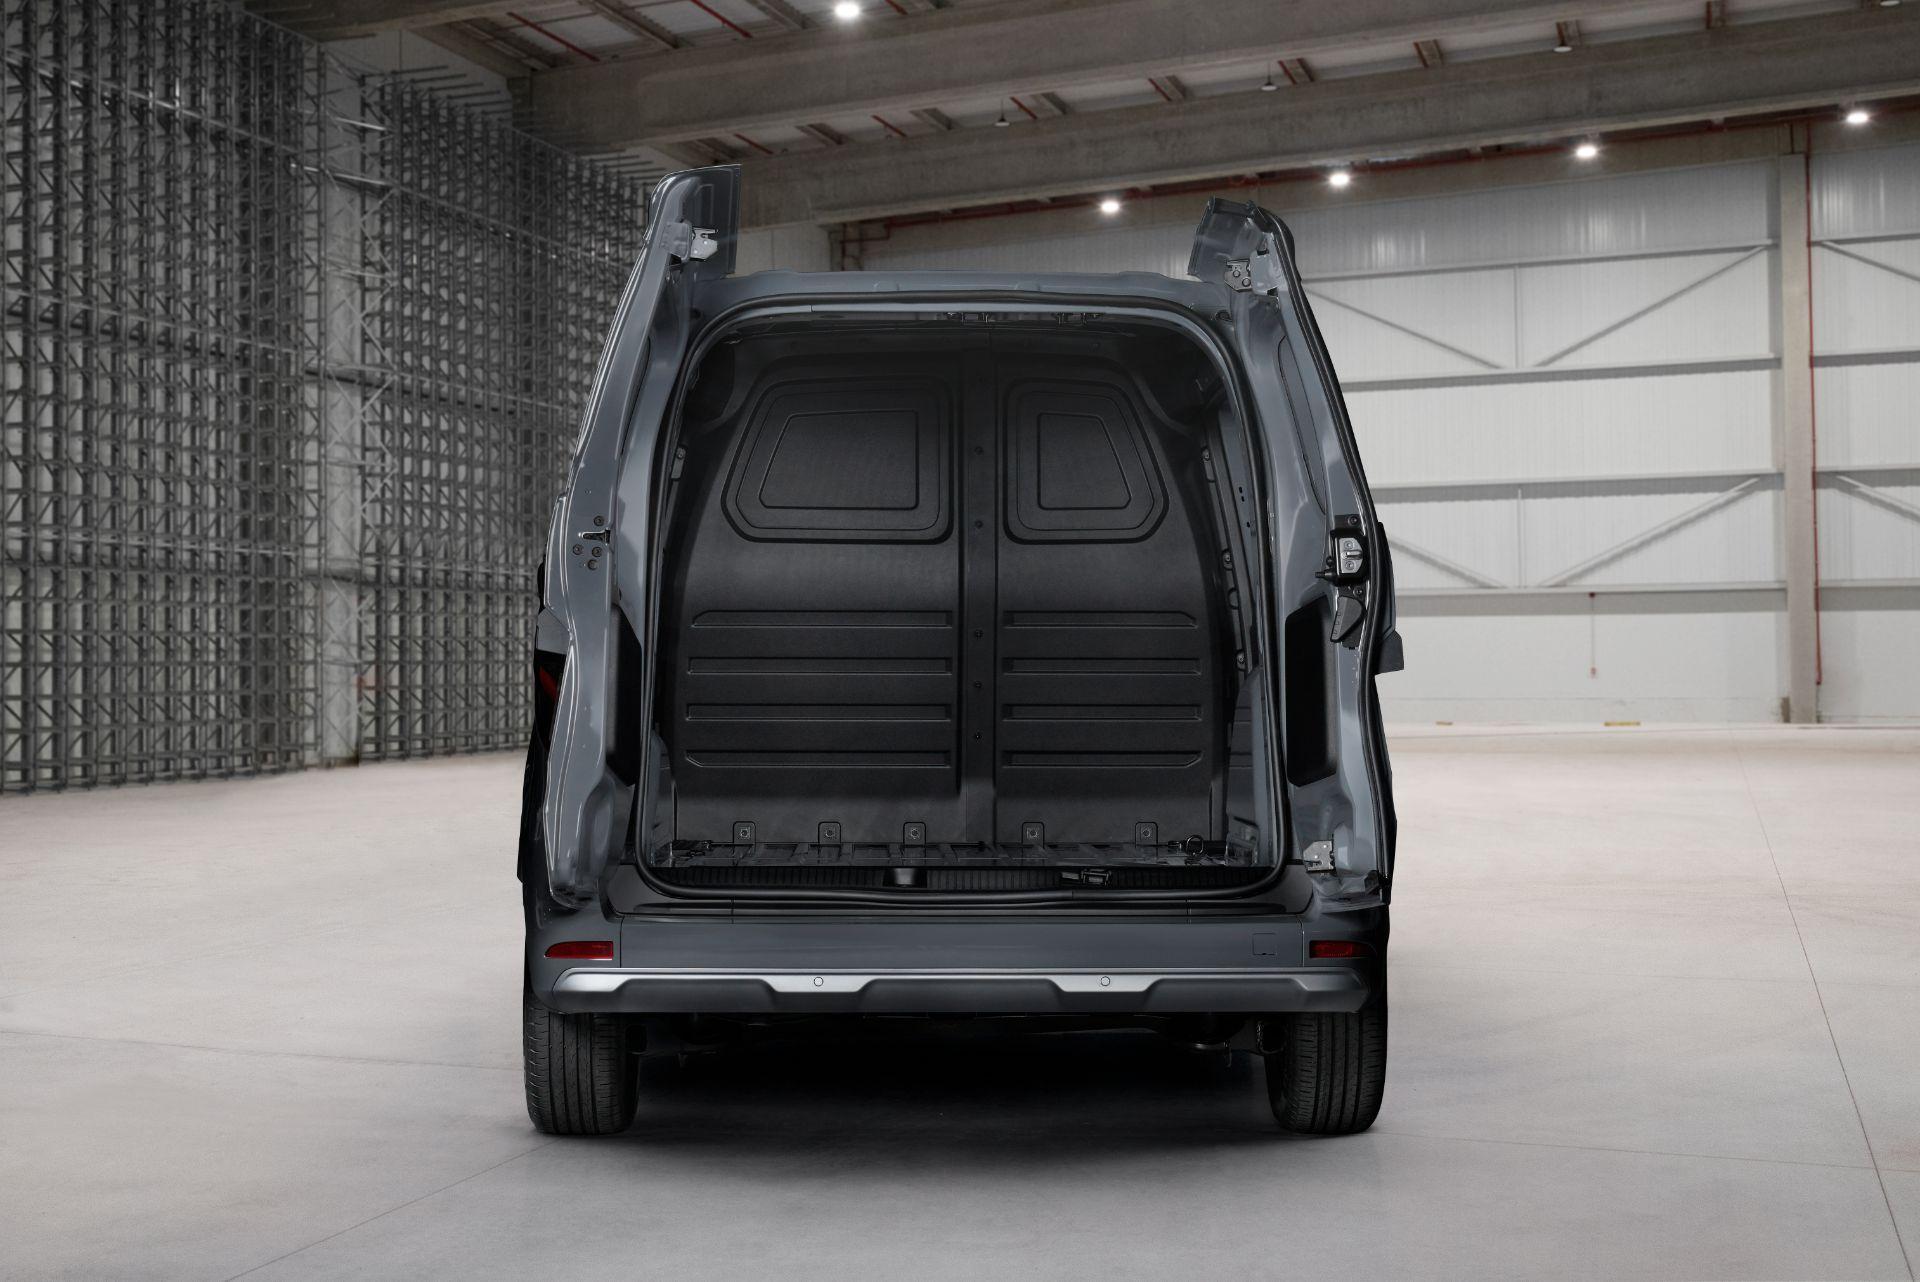 2022-Nissan-Townstar-petrol-van-dynamic-23